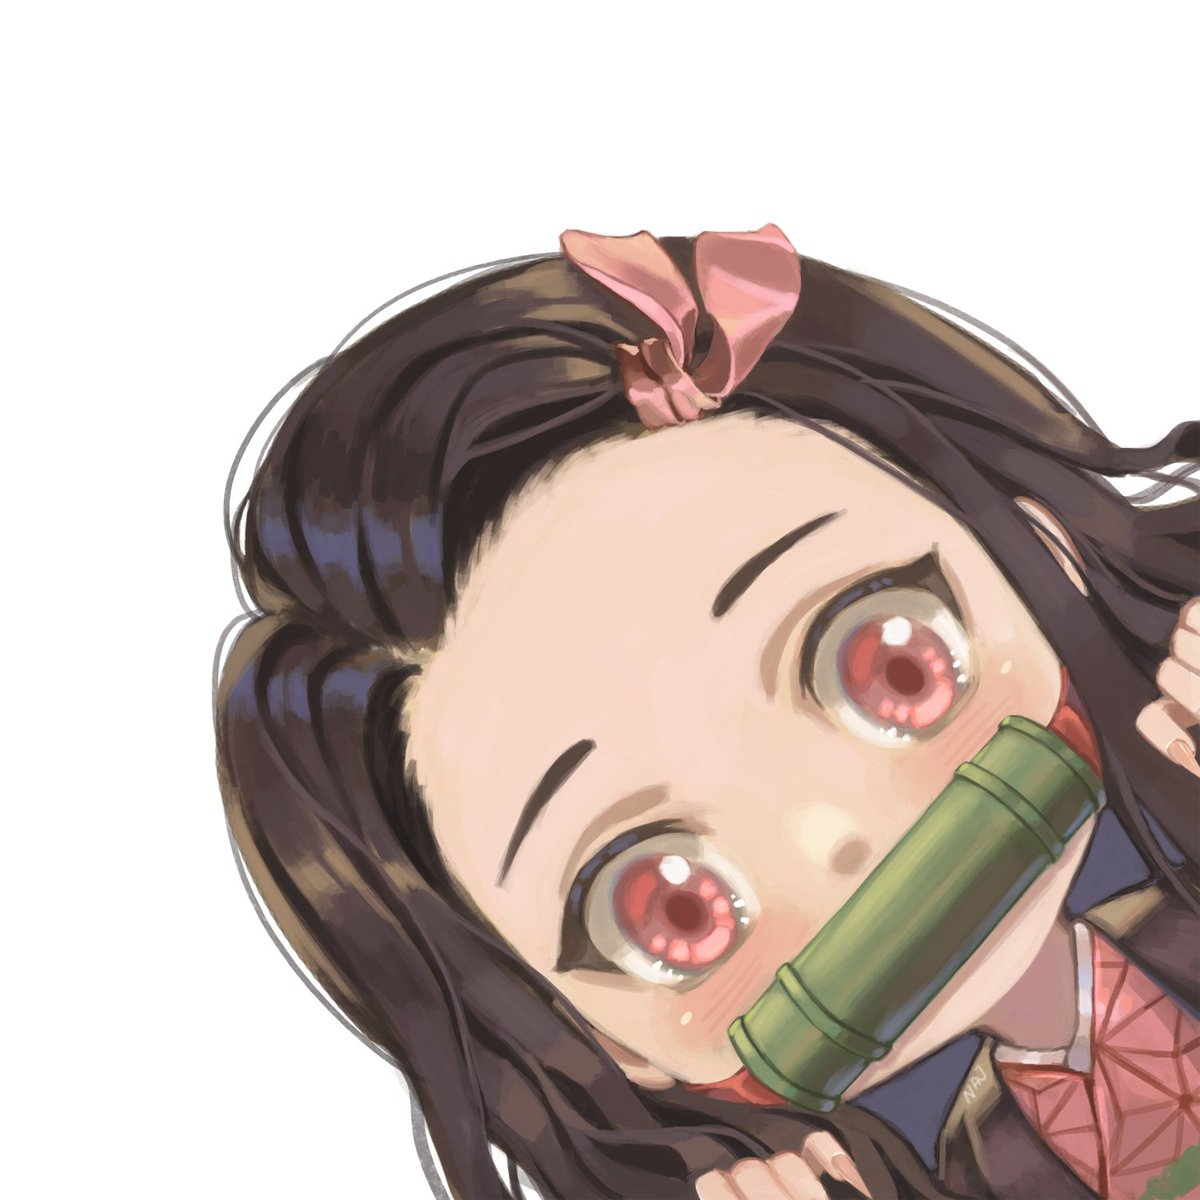 "najinichan в Twitter: ""Chibi Nezuko simple fanart #KNY #kimetsunoyaiba  #kimetsu_no_yaiba #DemonSlayer #Nezuko #artistontwitter #FANART… """